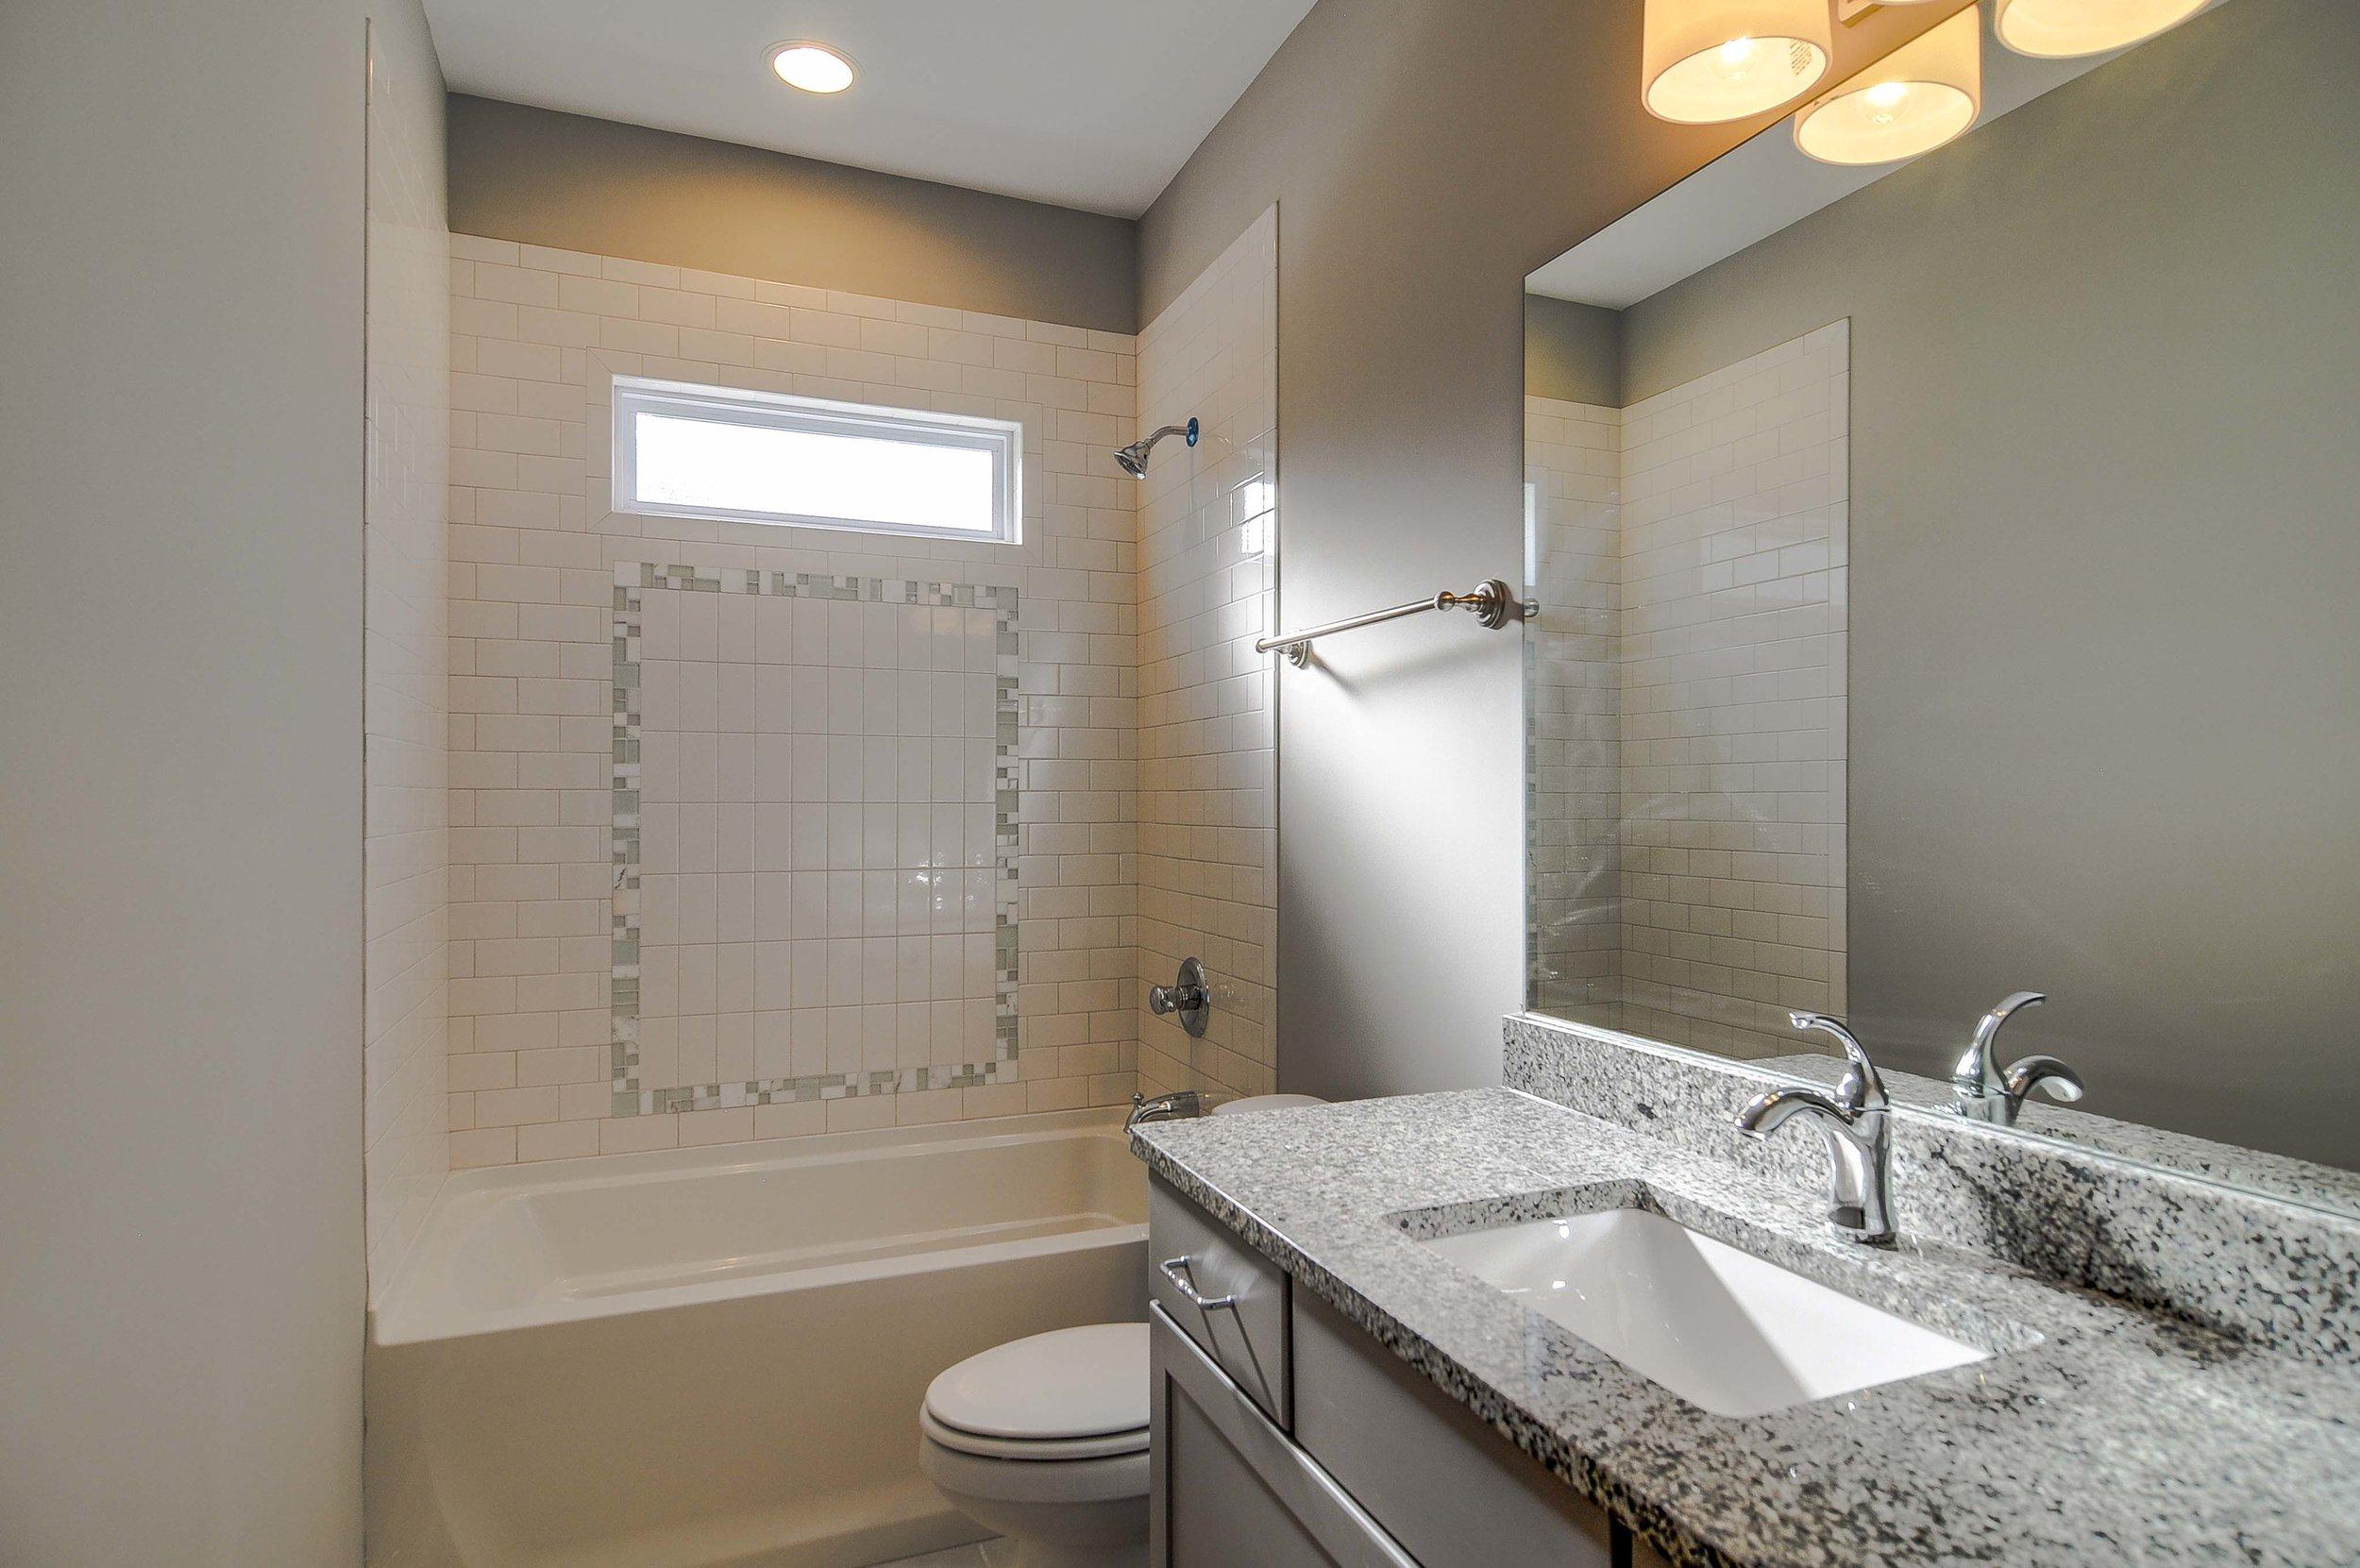 House-Plans-Online-Nashville-Narrow-Bath-Tile-Kentucky.jpg